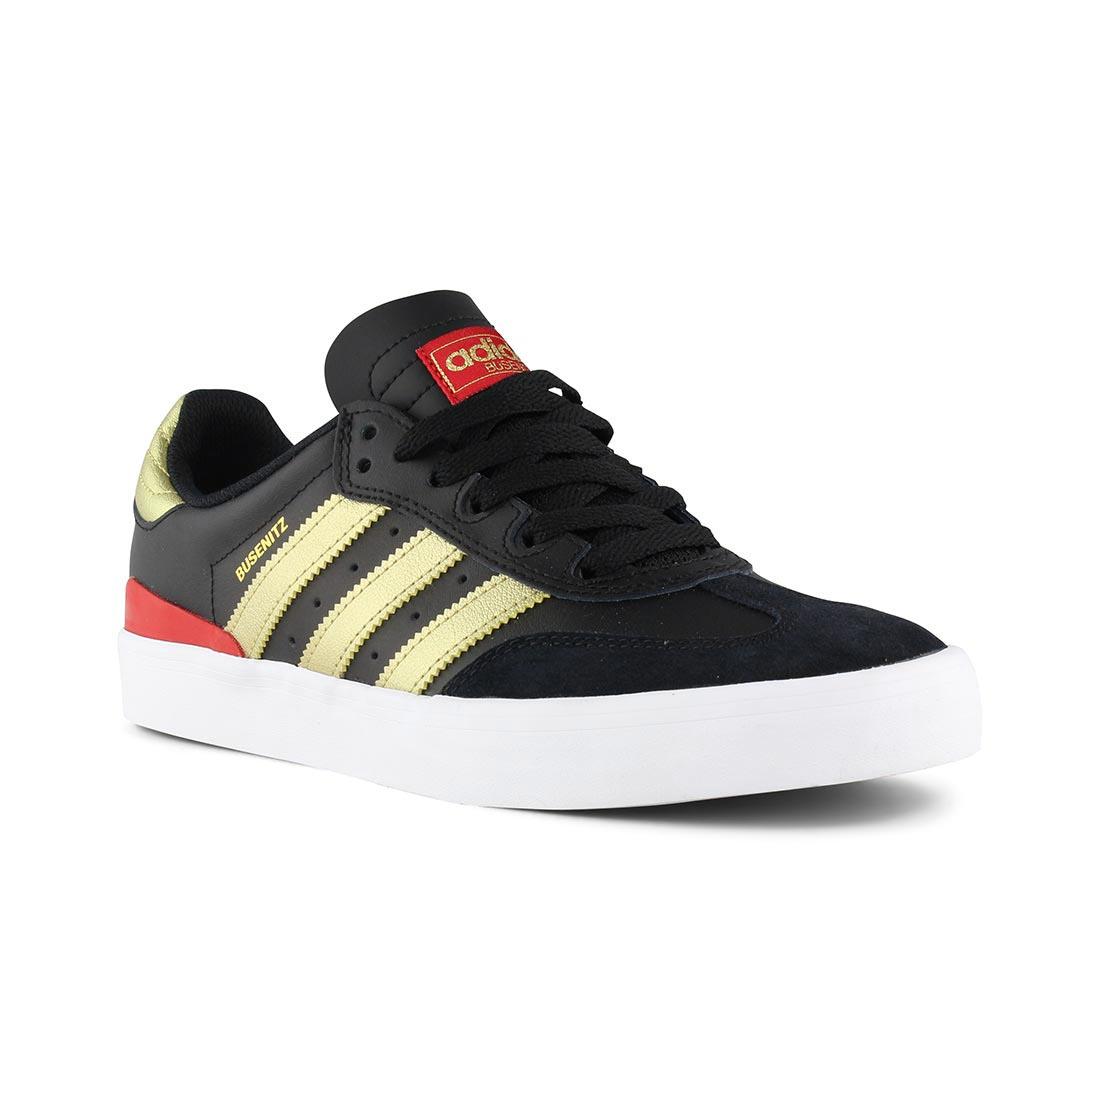 Adidas Shoes Scarlet Metallic Rx Vulc Black Busenitz Gold derBCxWQoE